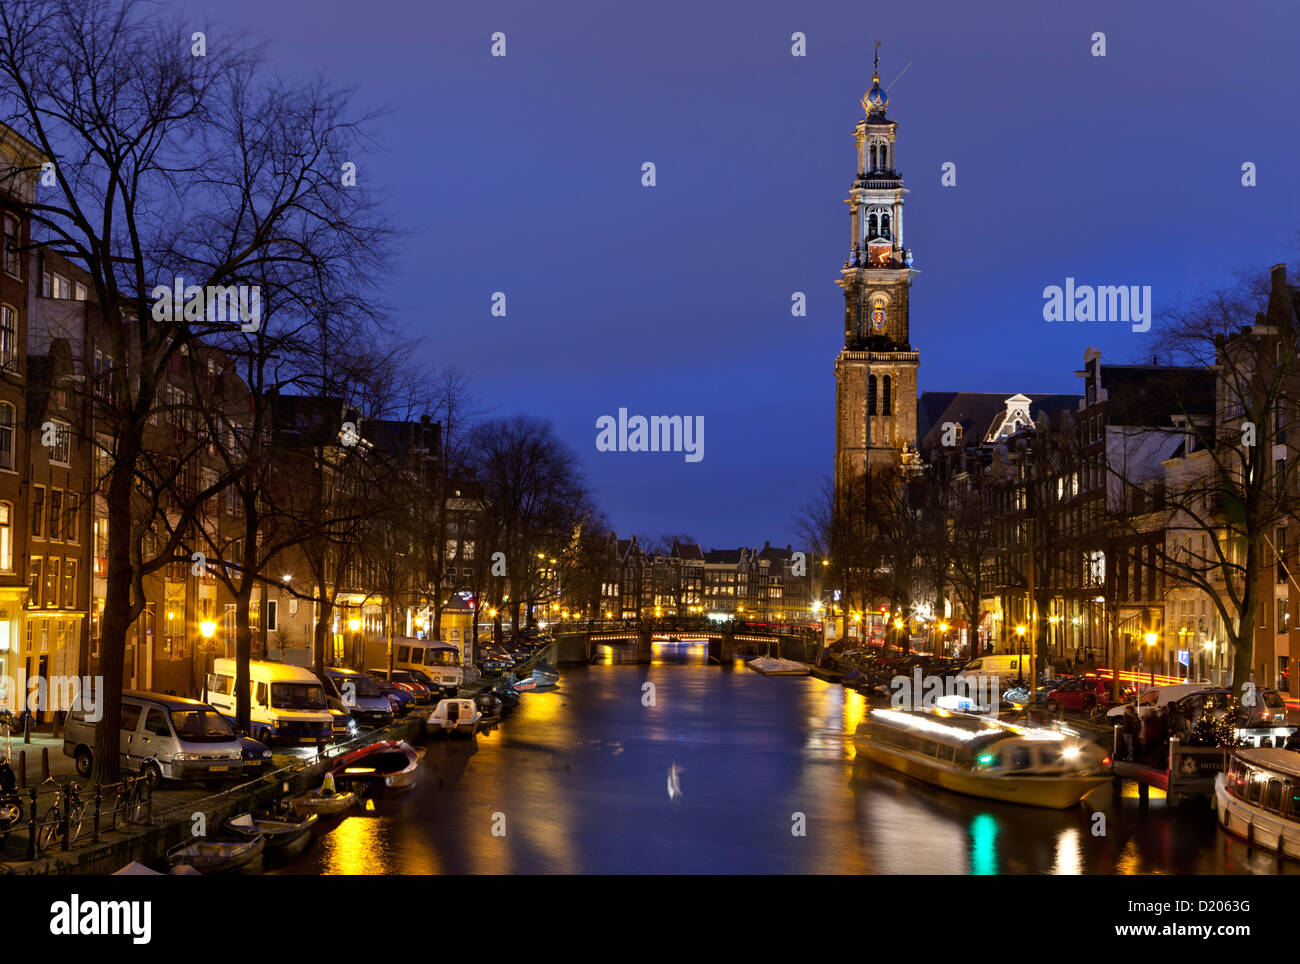 Westerkerk church tower on Prinsengracht at night, Amsterdam, Netherlands - Stock Image